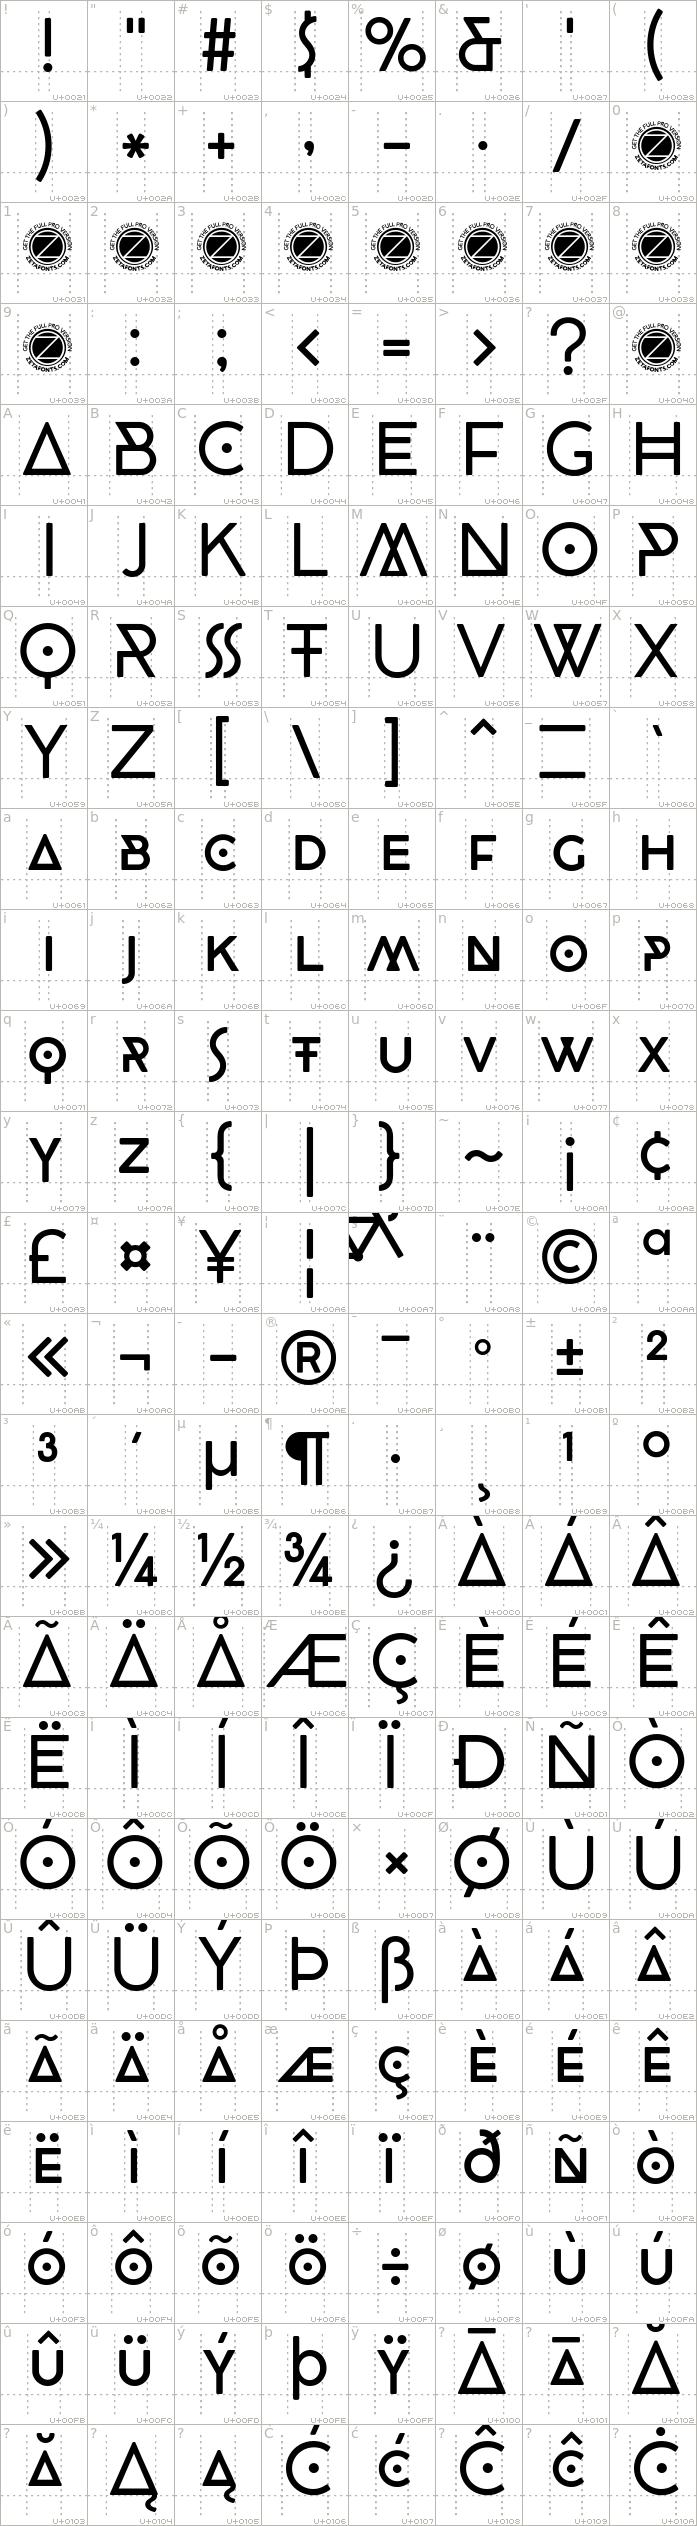 cocobiker.regular.character-map-1